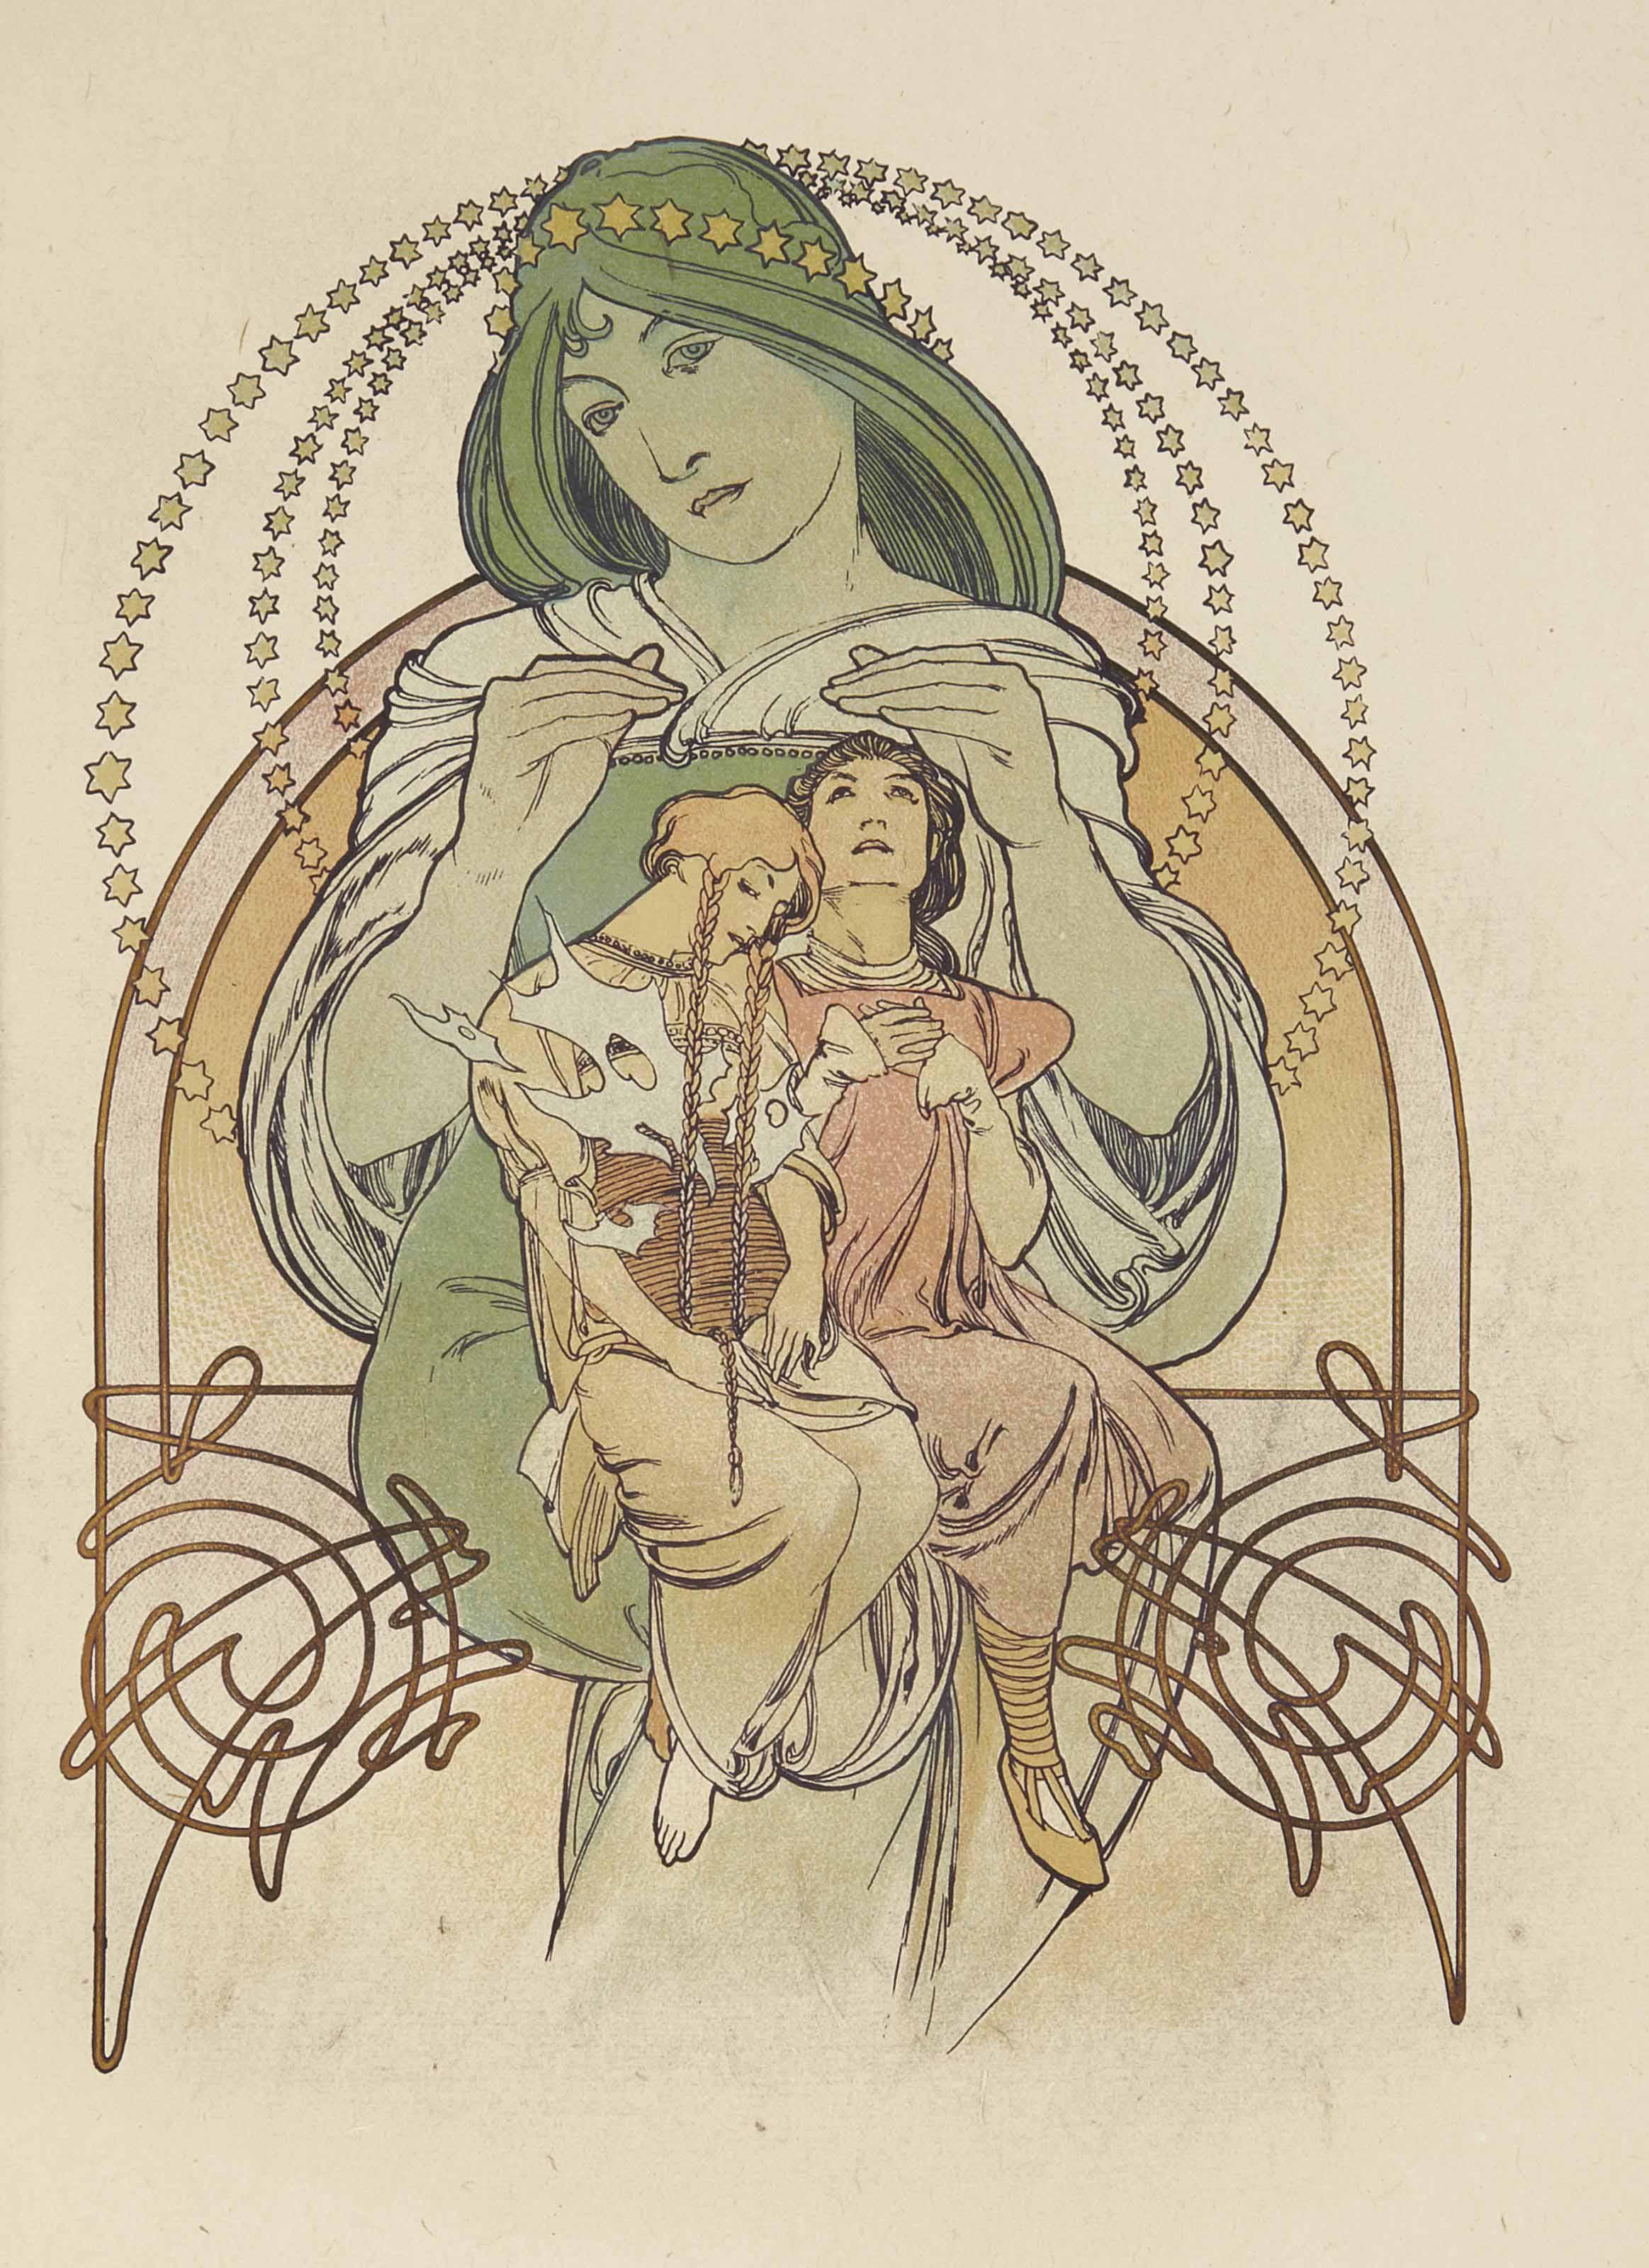 [MUCHA] -- FLERS, Robert de (1872-1927). Ilsée. Princesse de Tripoli. Paris: Piazza, 1897.